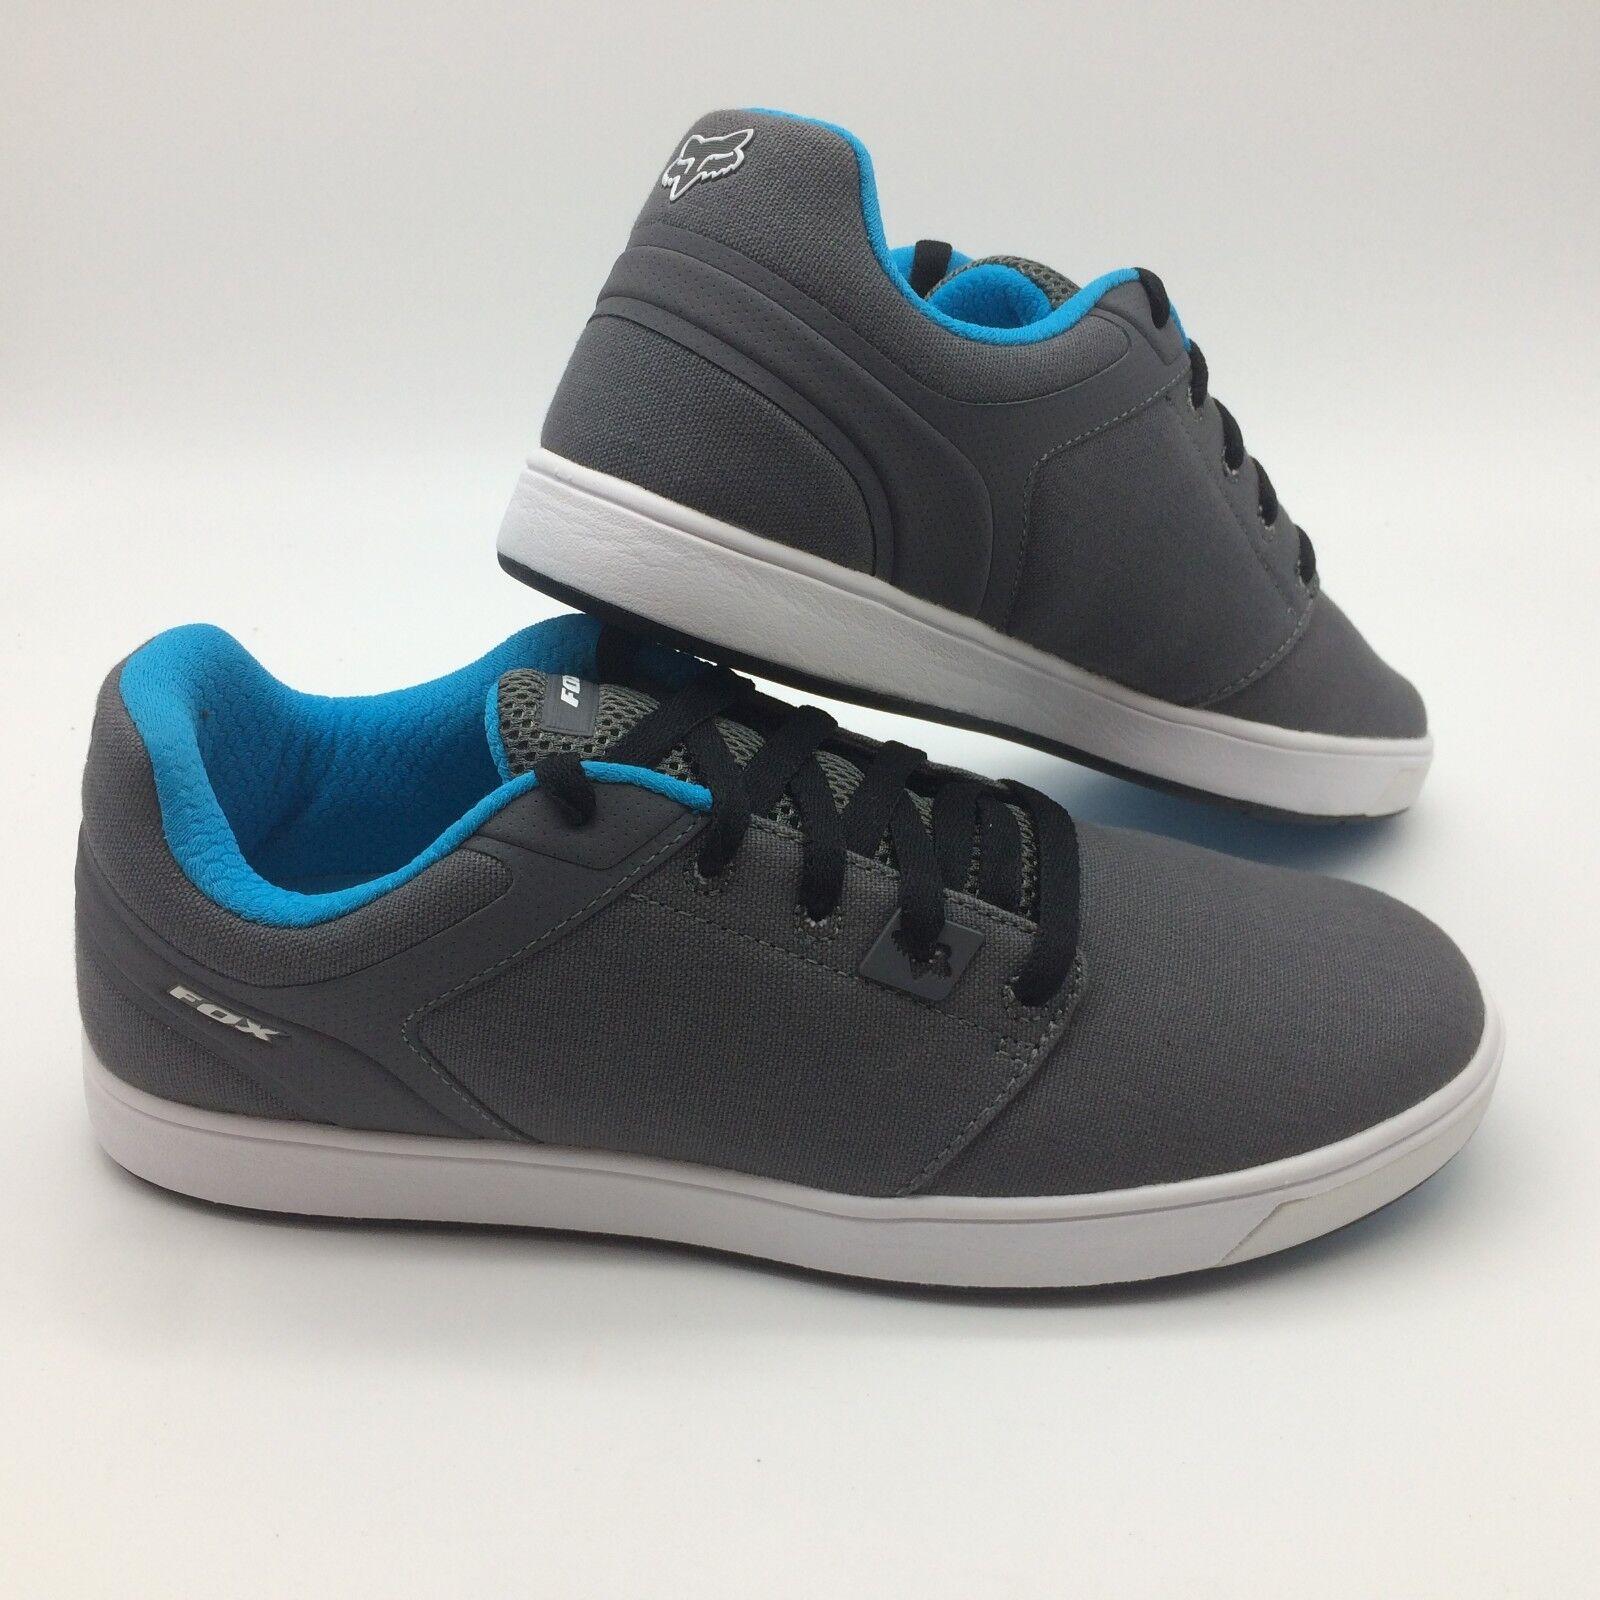 Fox Men's shoes  Motion Scrub Fresh  Grey White